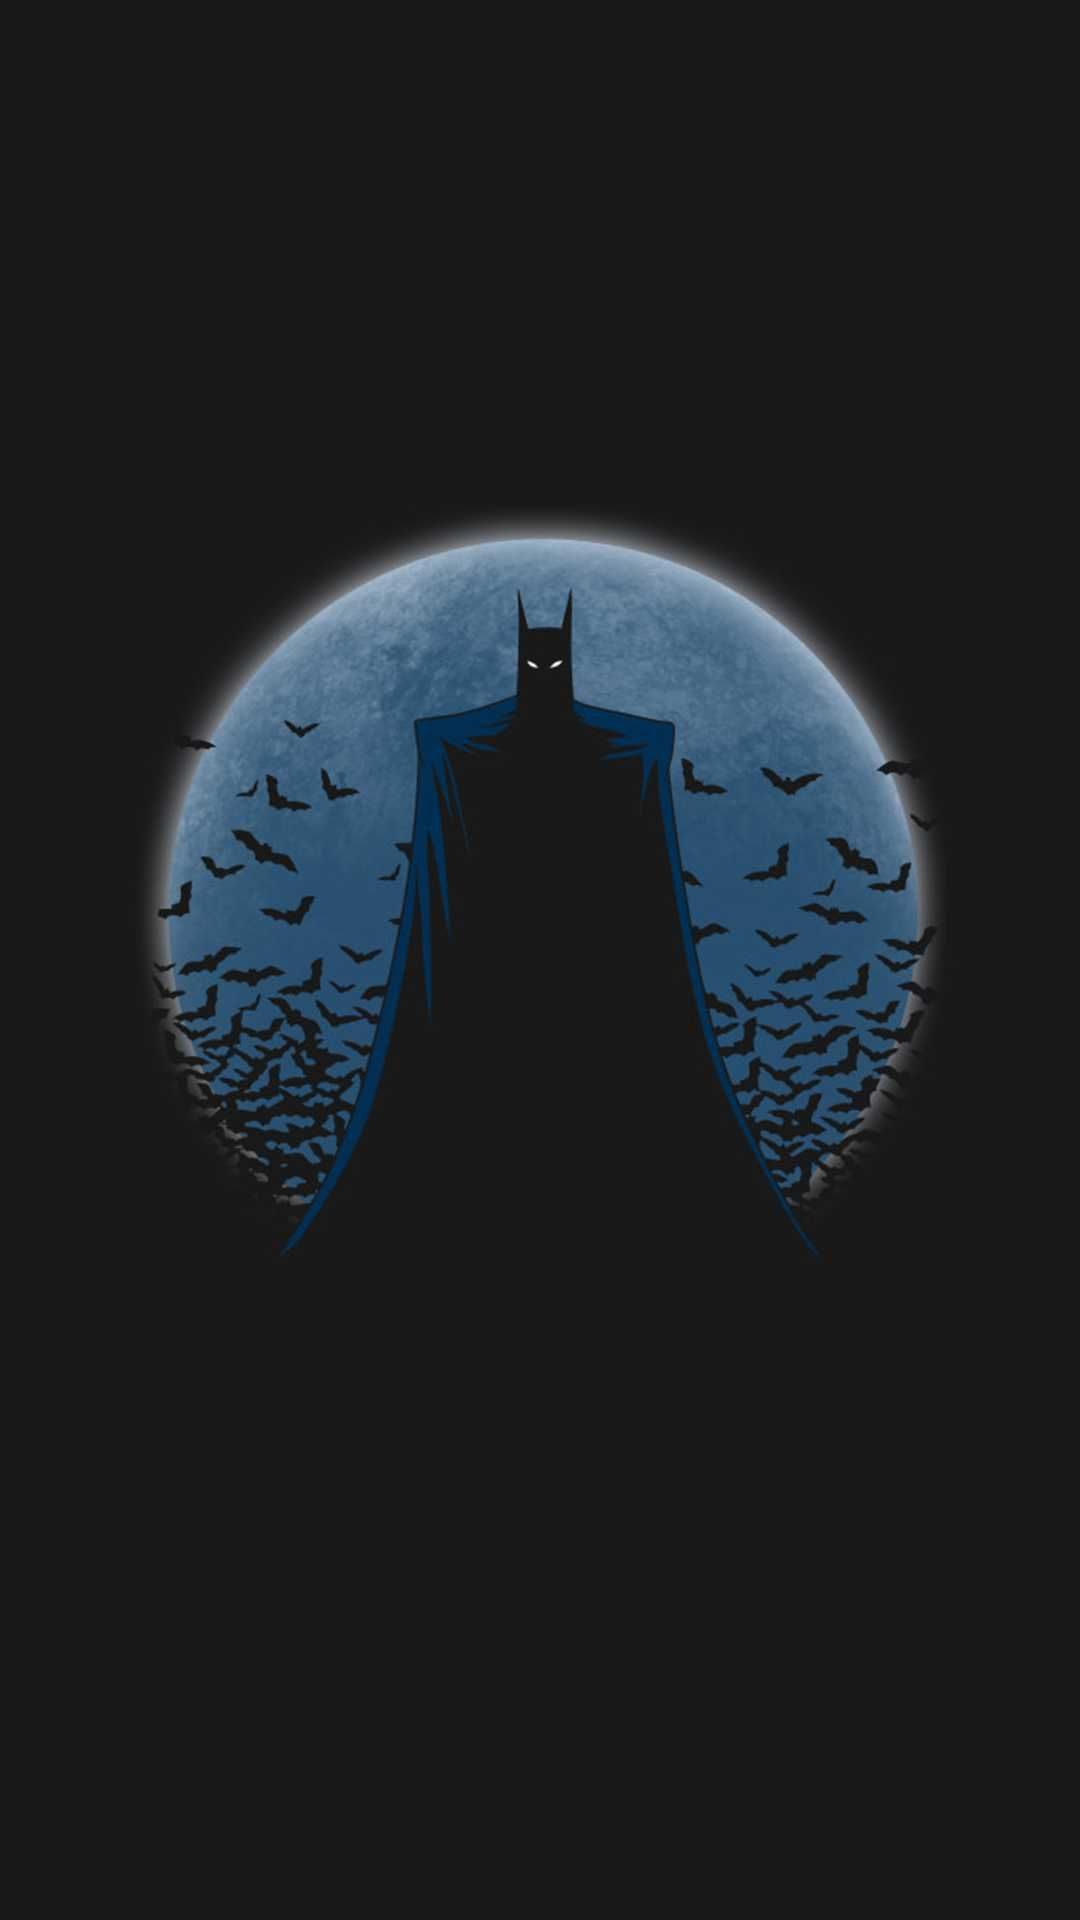 Download The Batman Minimal Dark Wallpaper Top Free Awesome